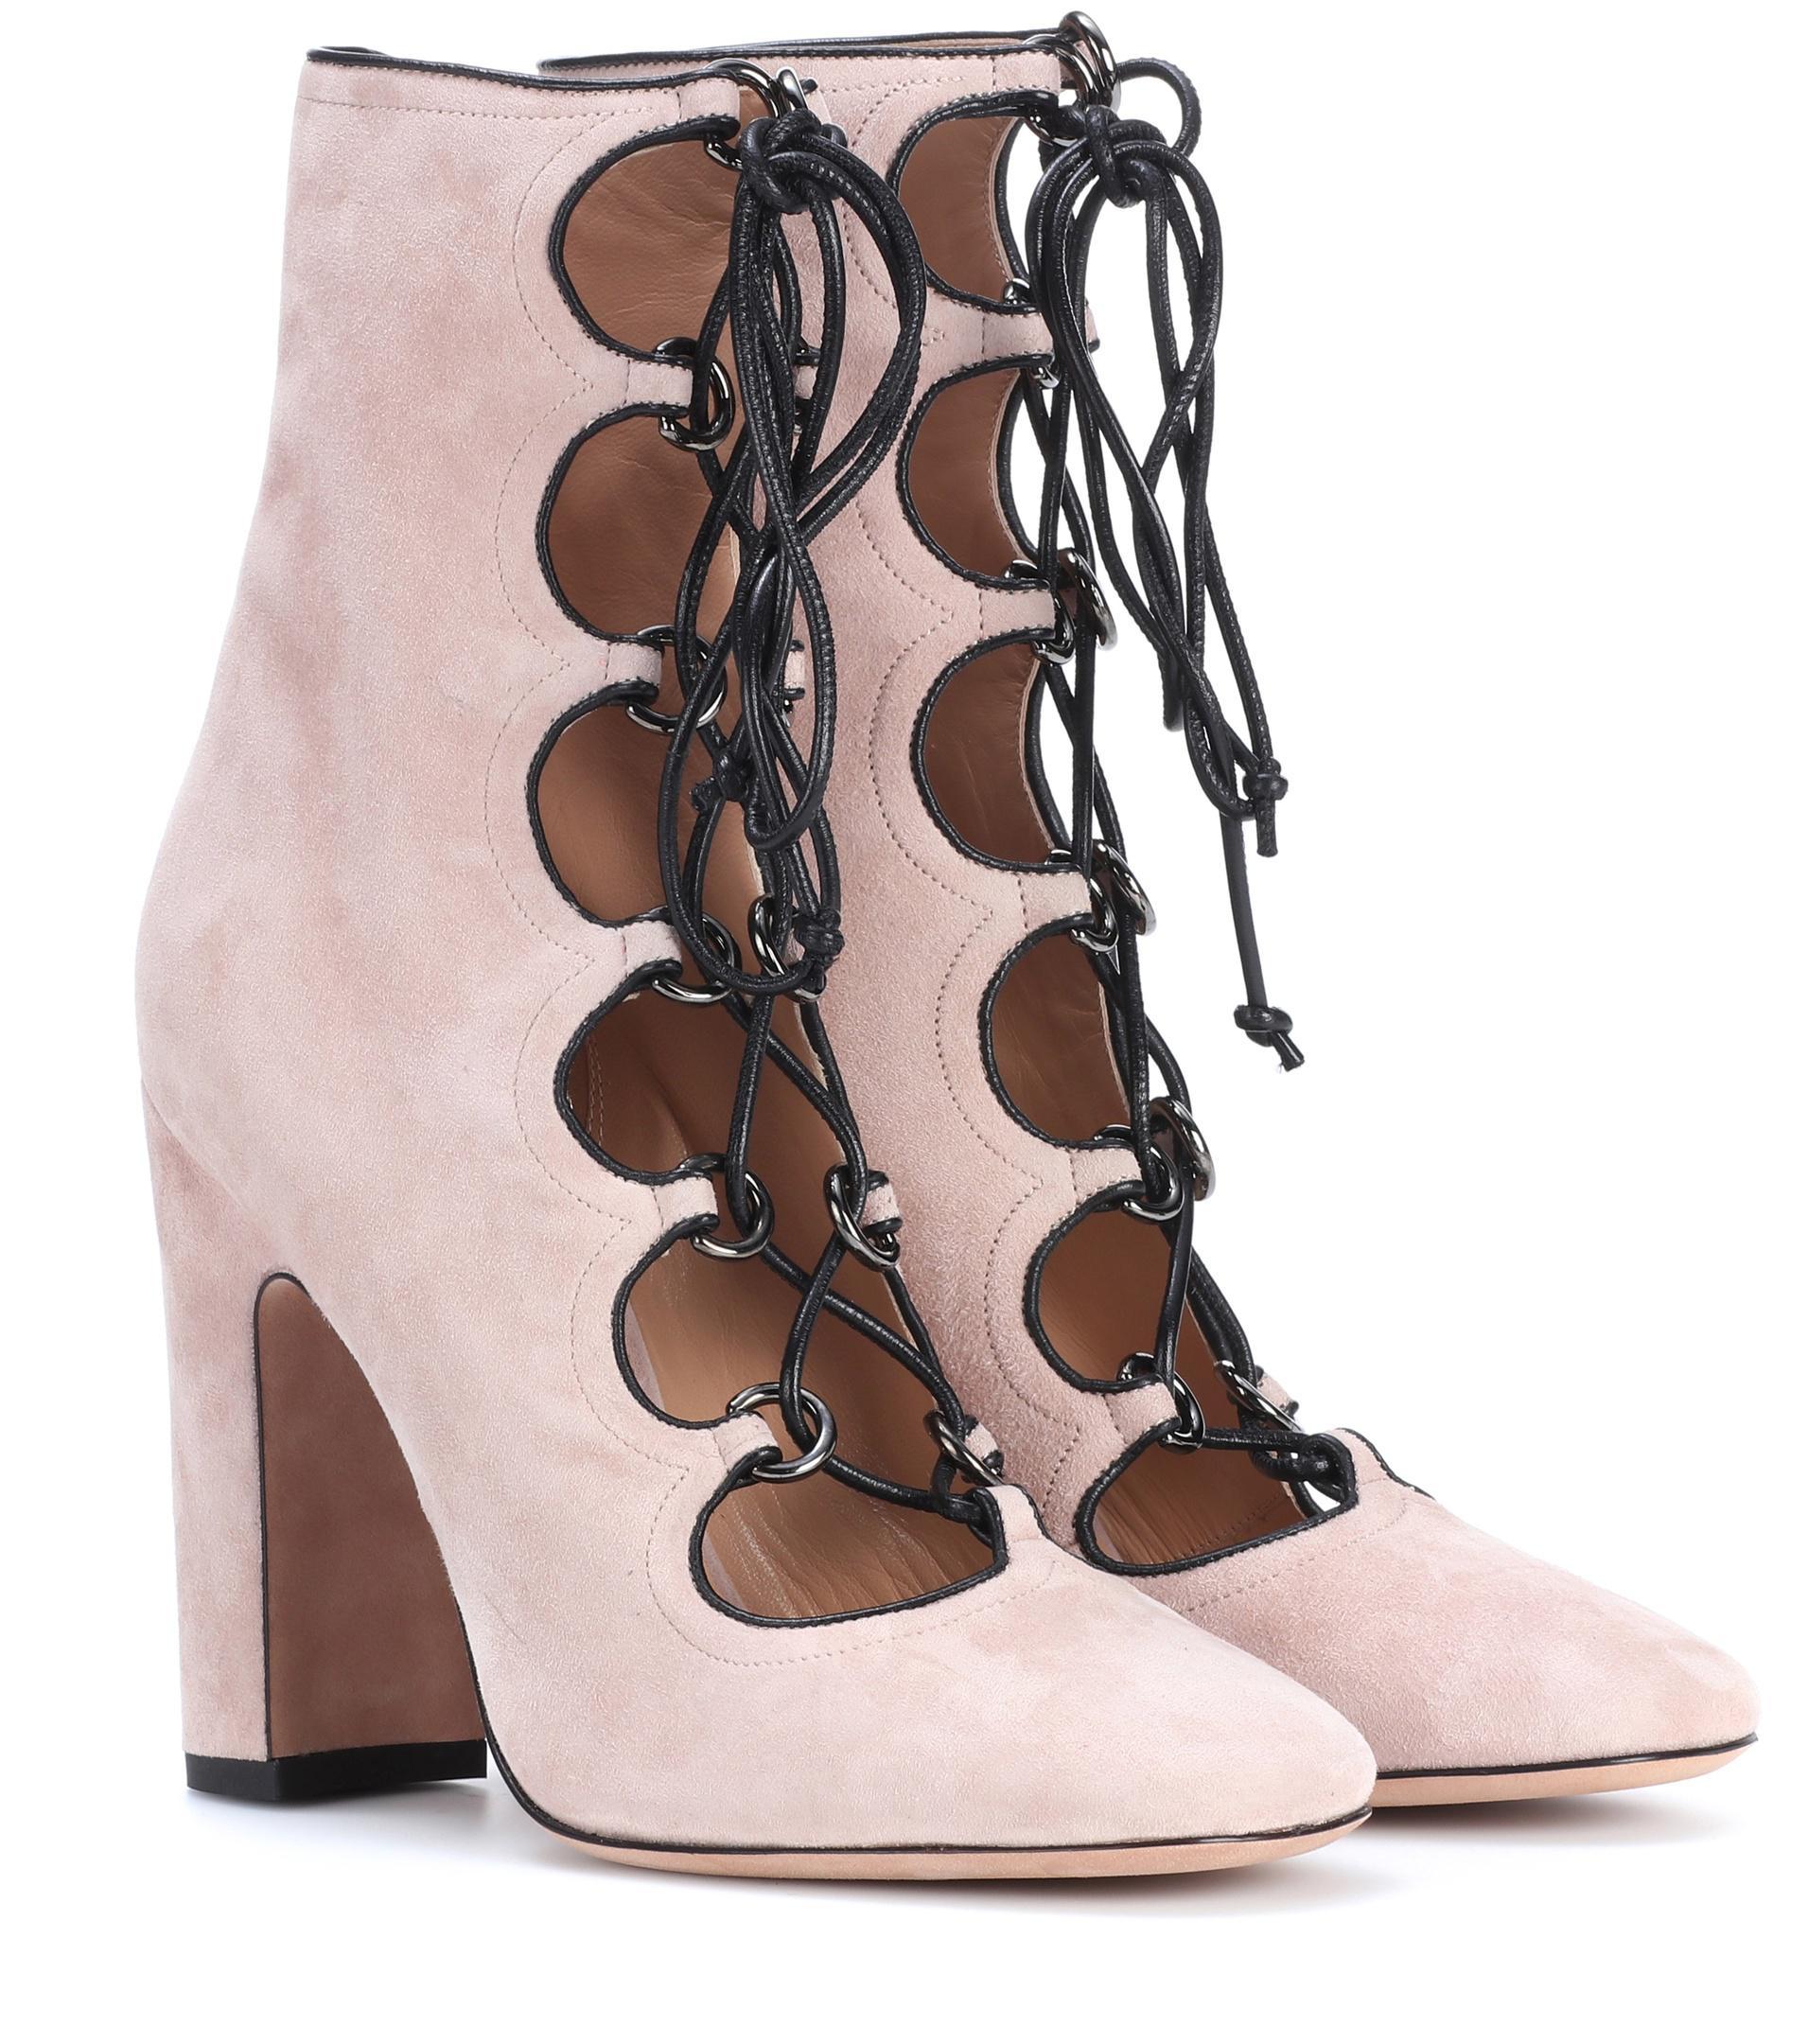 Valentino Brown Suede Kori Boots GIspASFx7